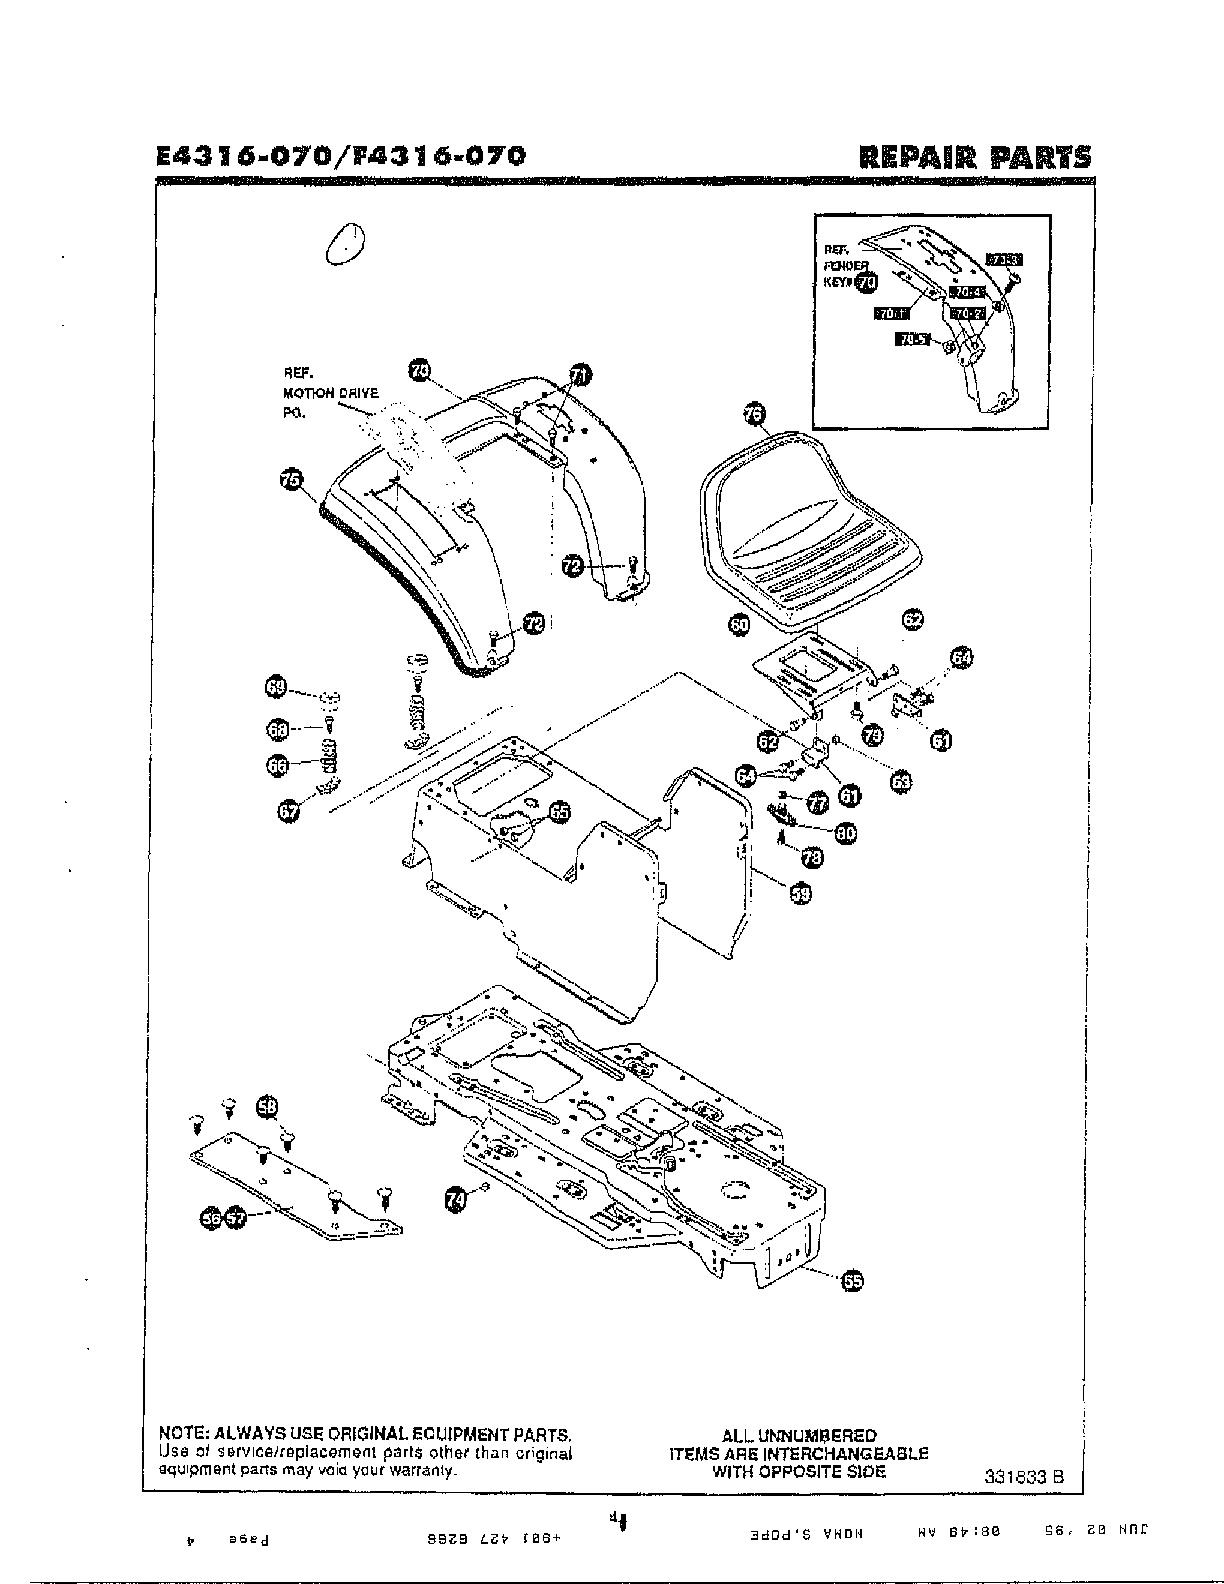 noma riding lawn mower parts diagram on tire tread diagram